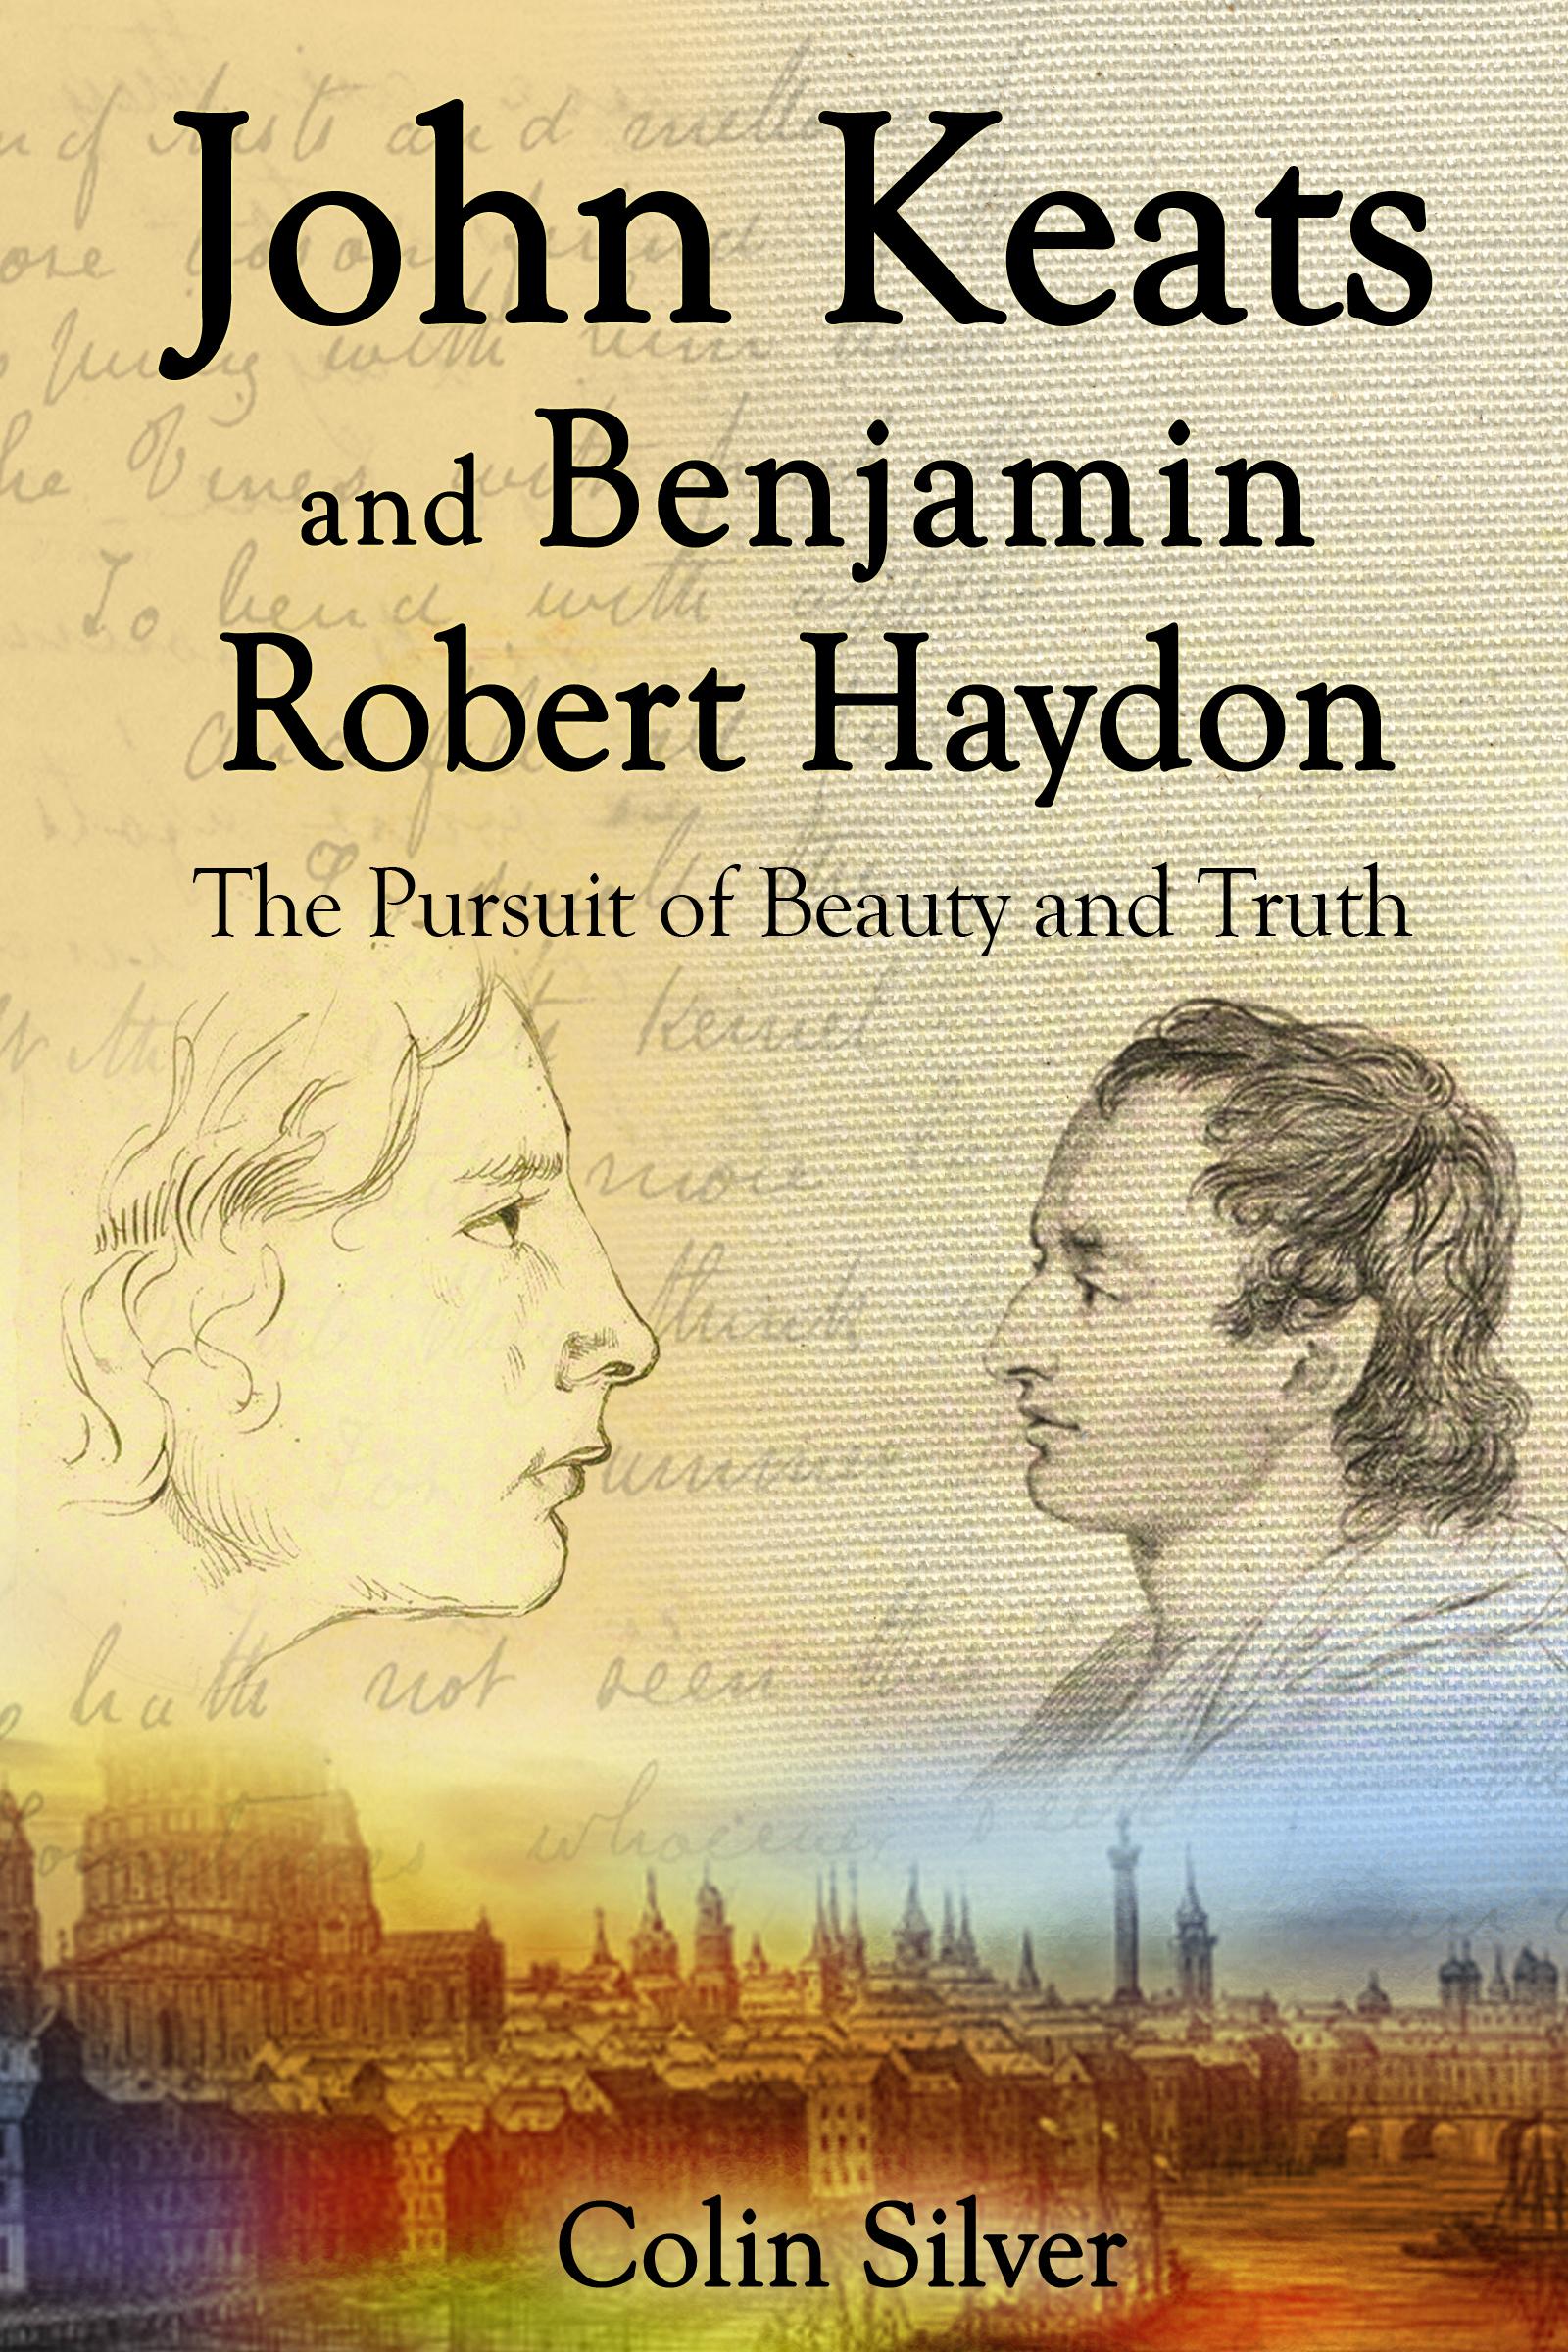 John Keats and Benjamin Robert Haydon. The Pursuit of Beauty and Truth.